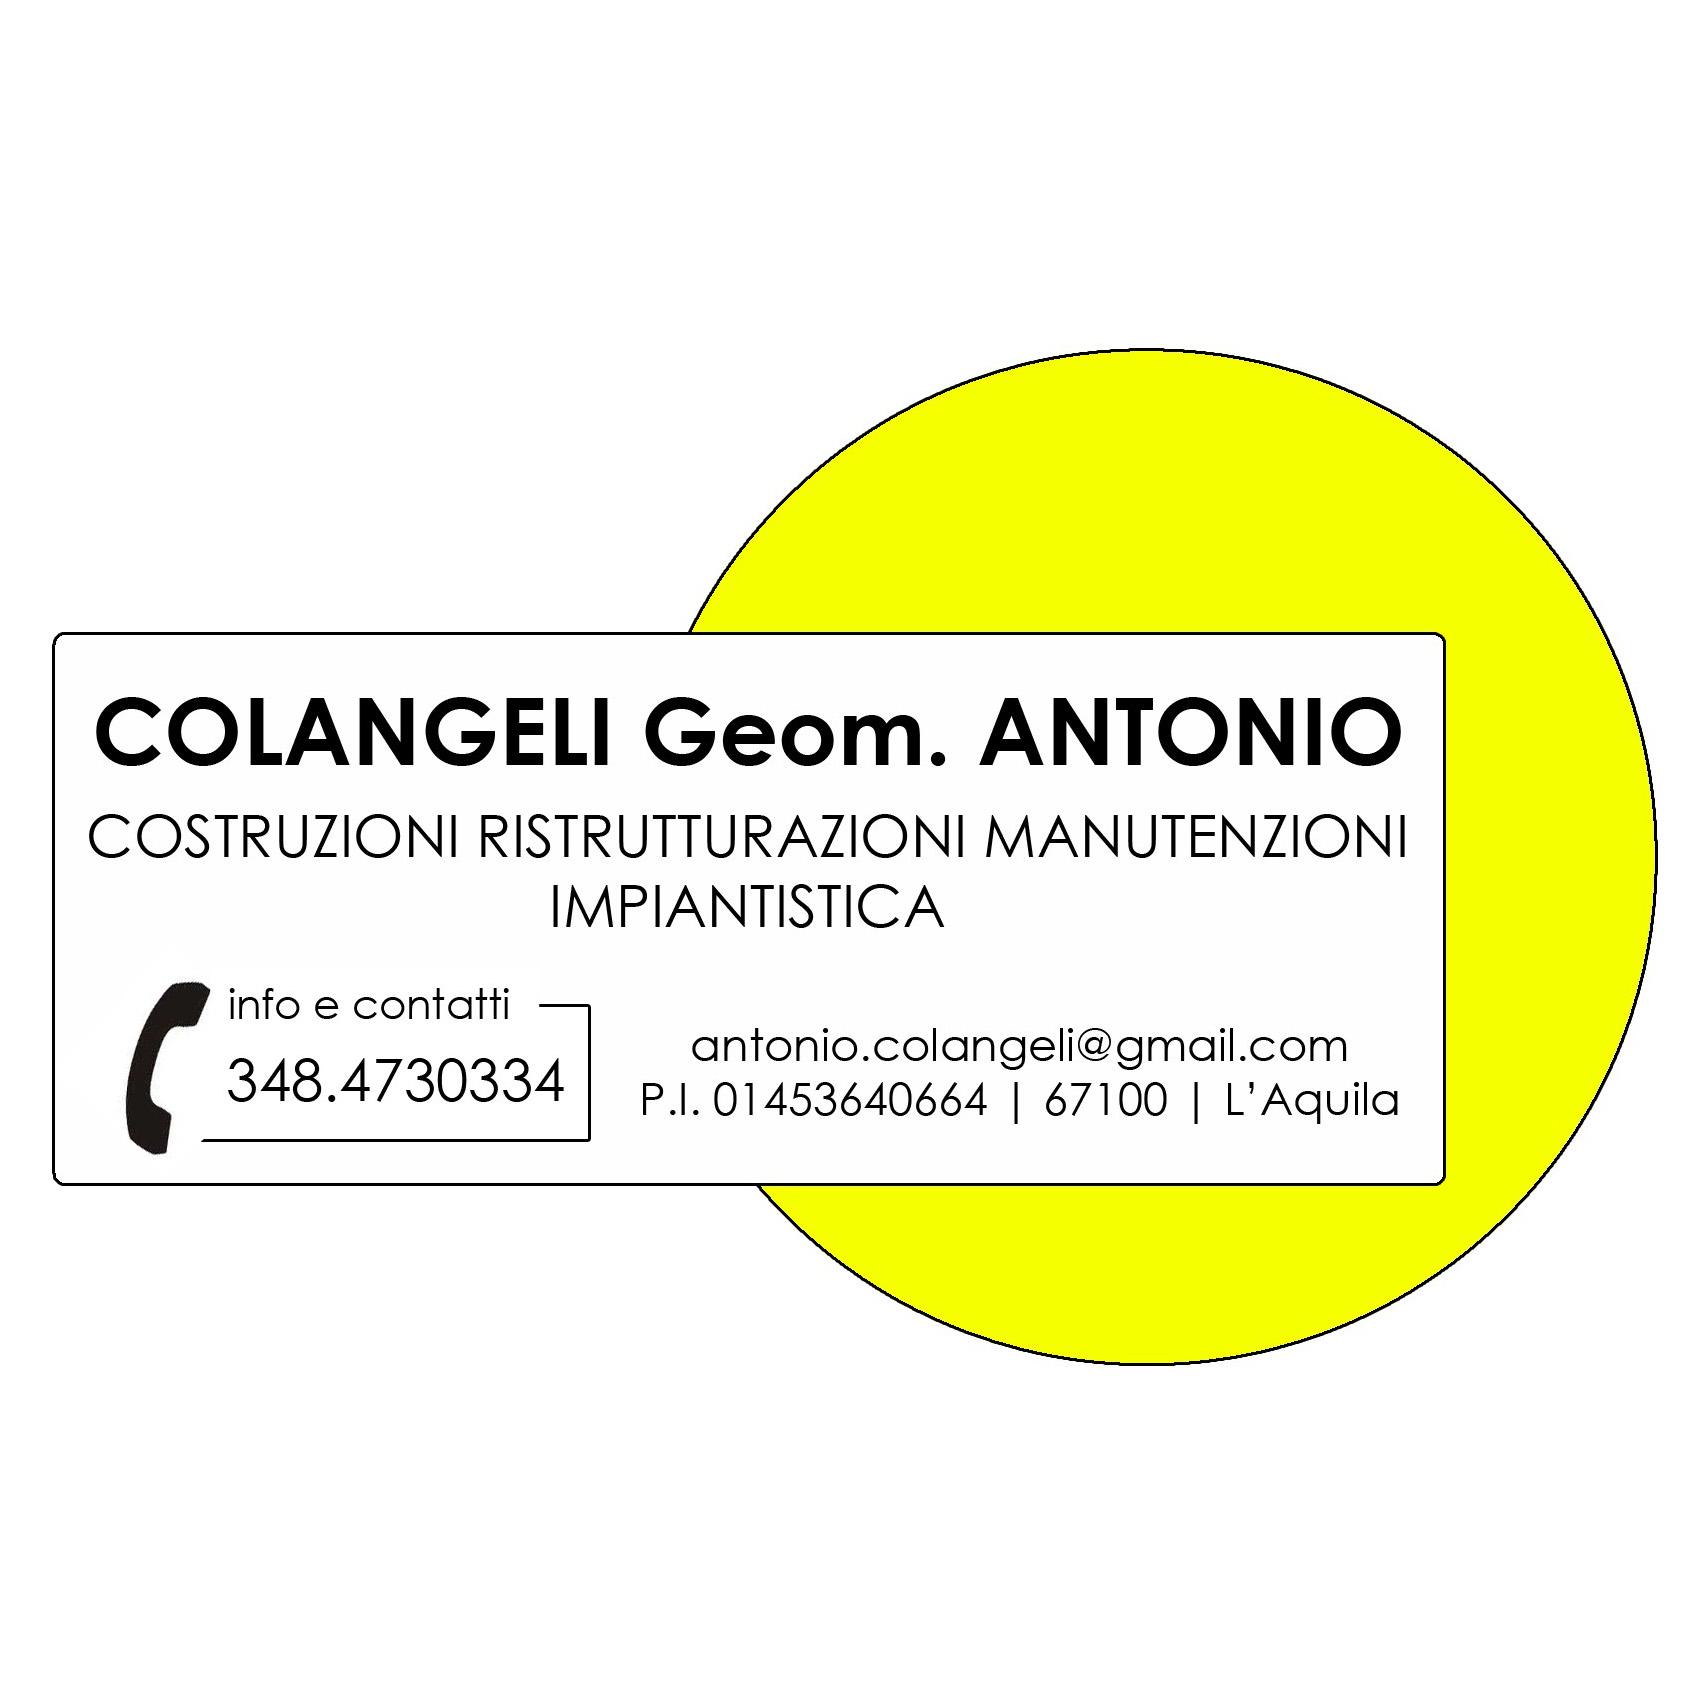 Geom. Antonio Colangeli